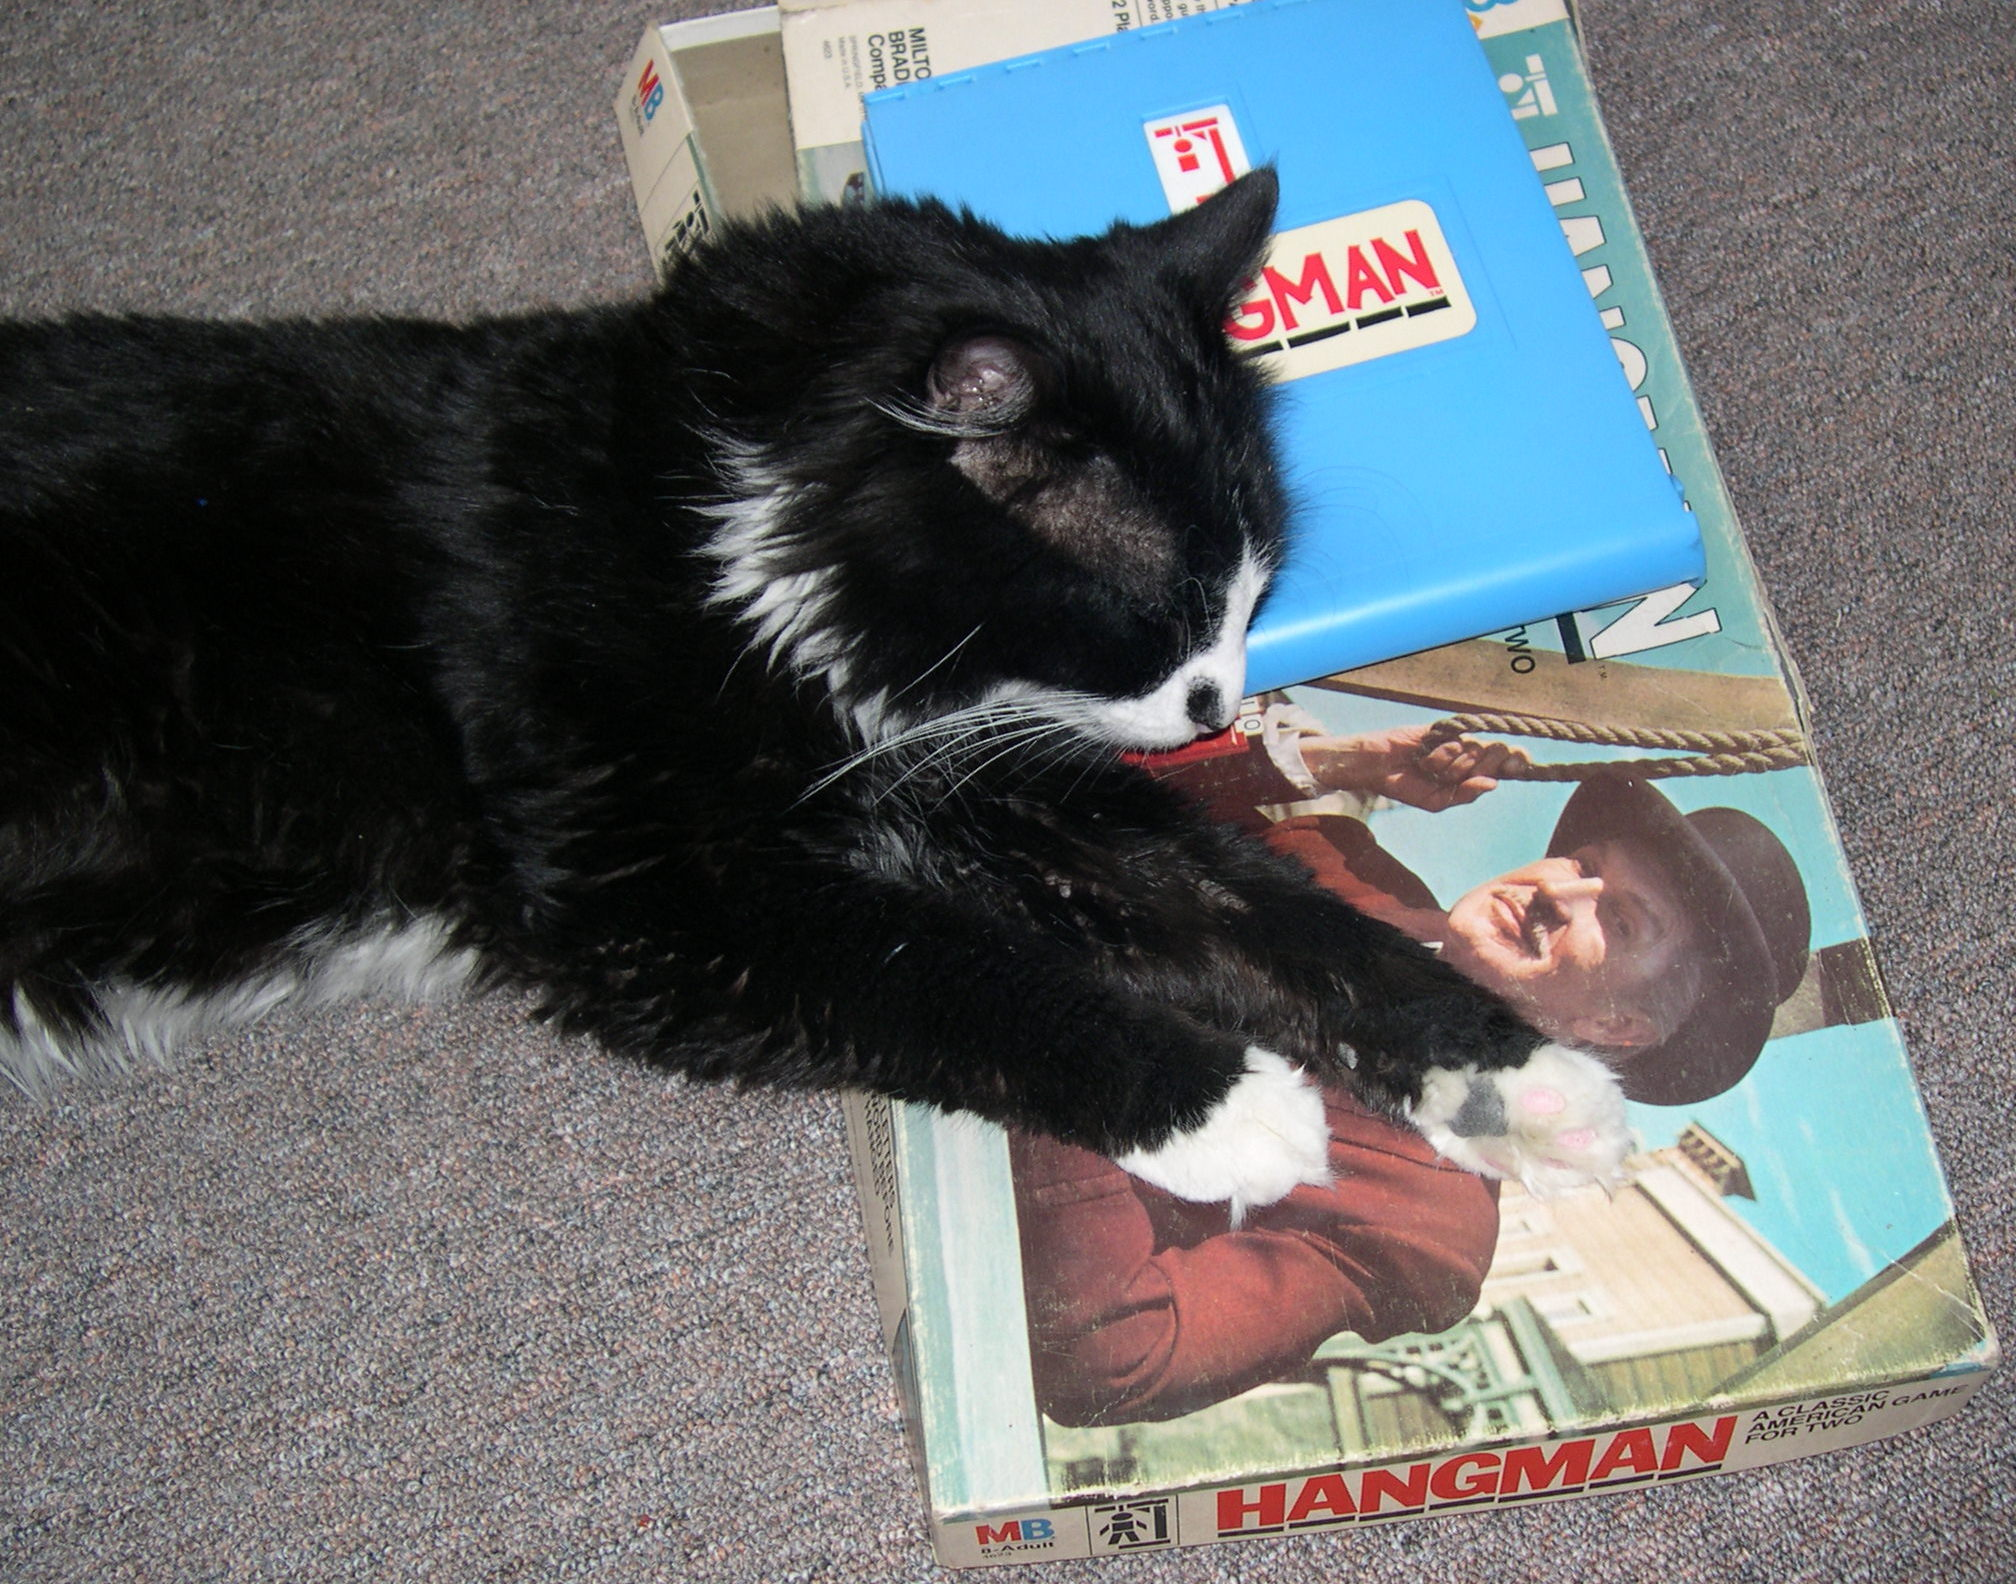 Cat sleeping on Hangman game